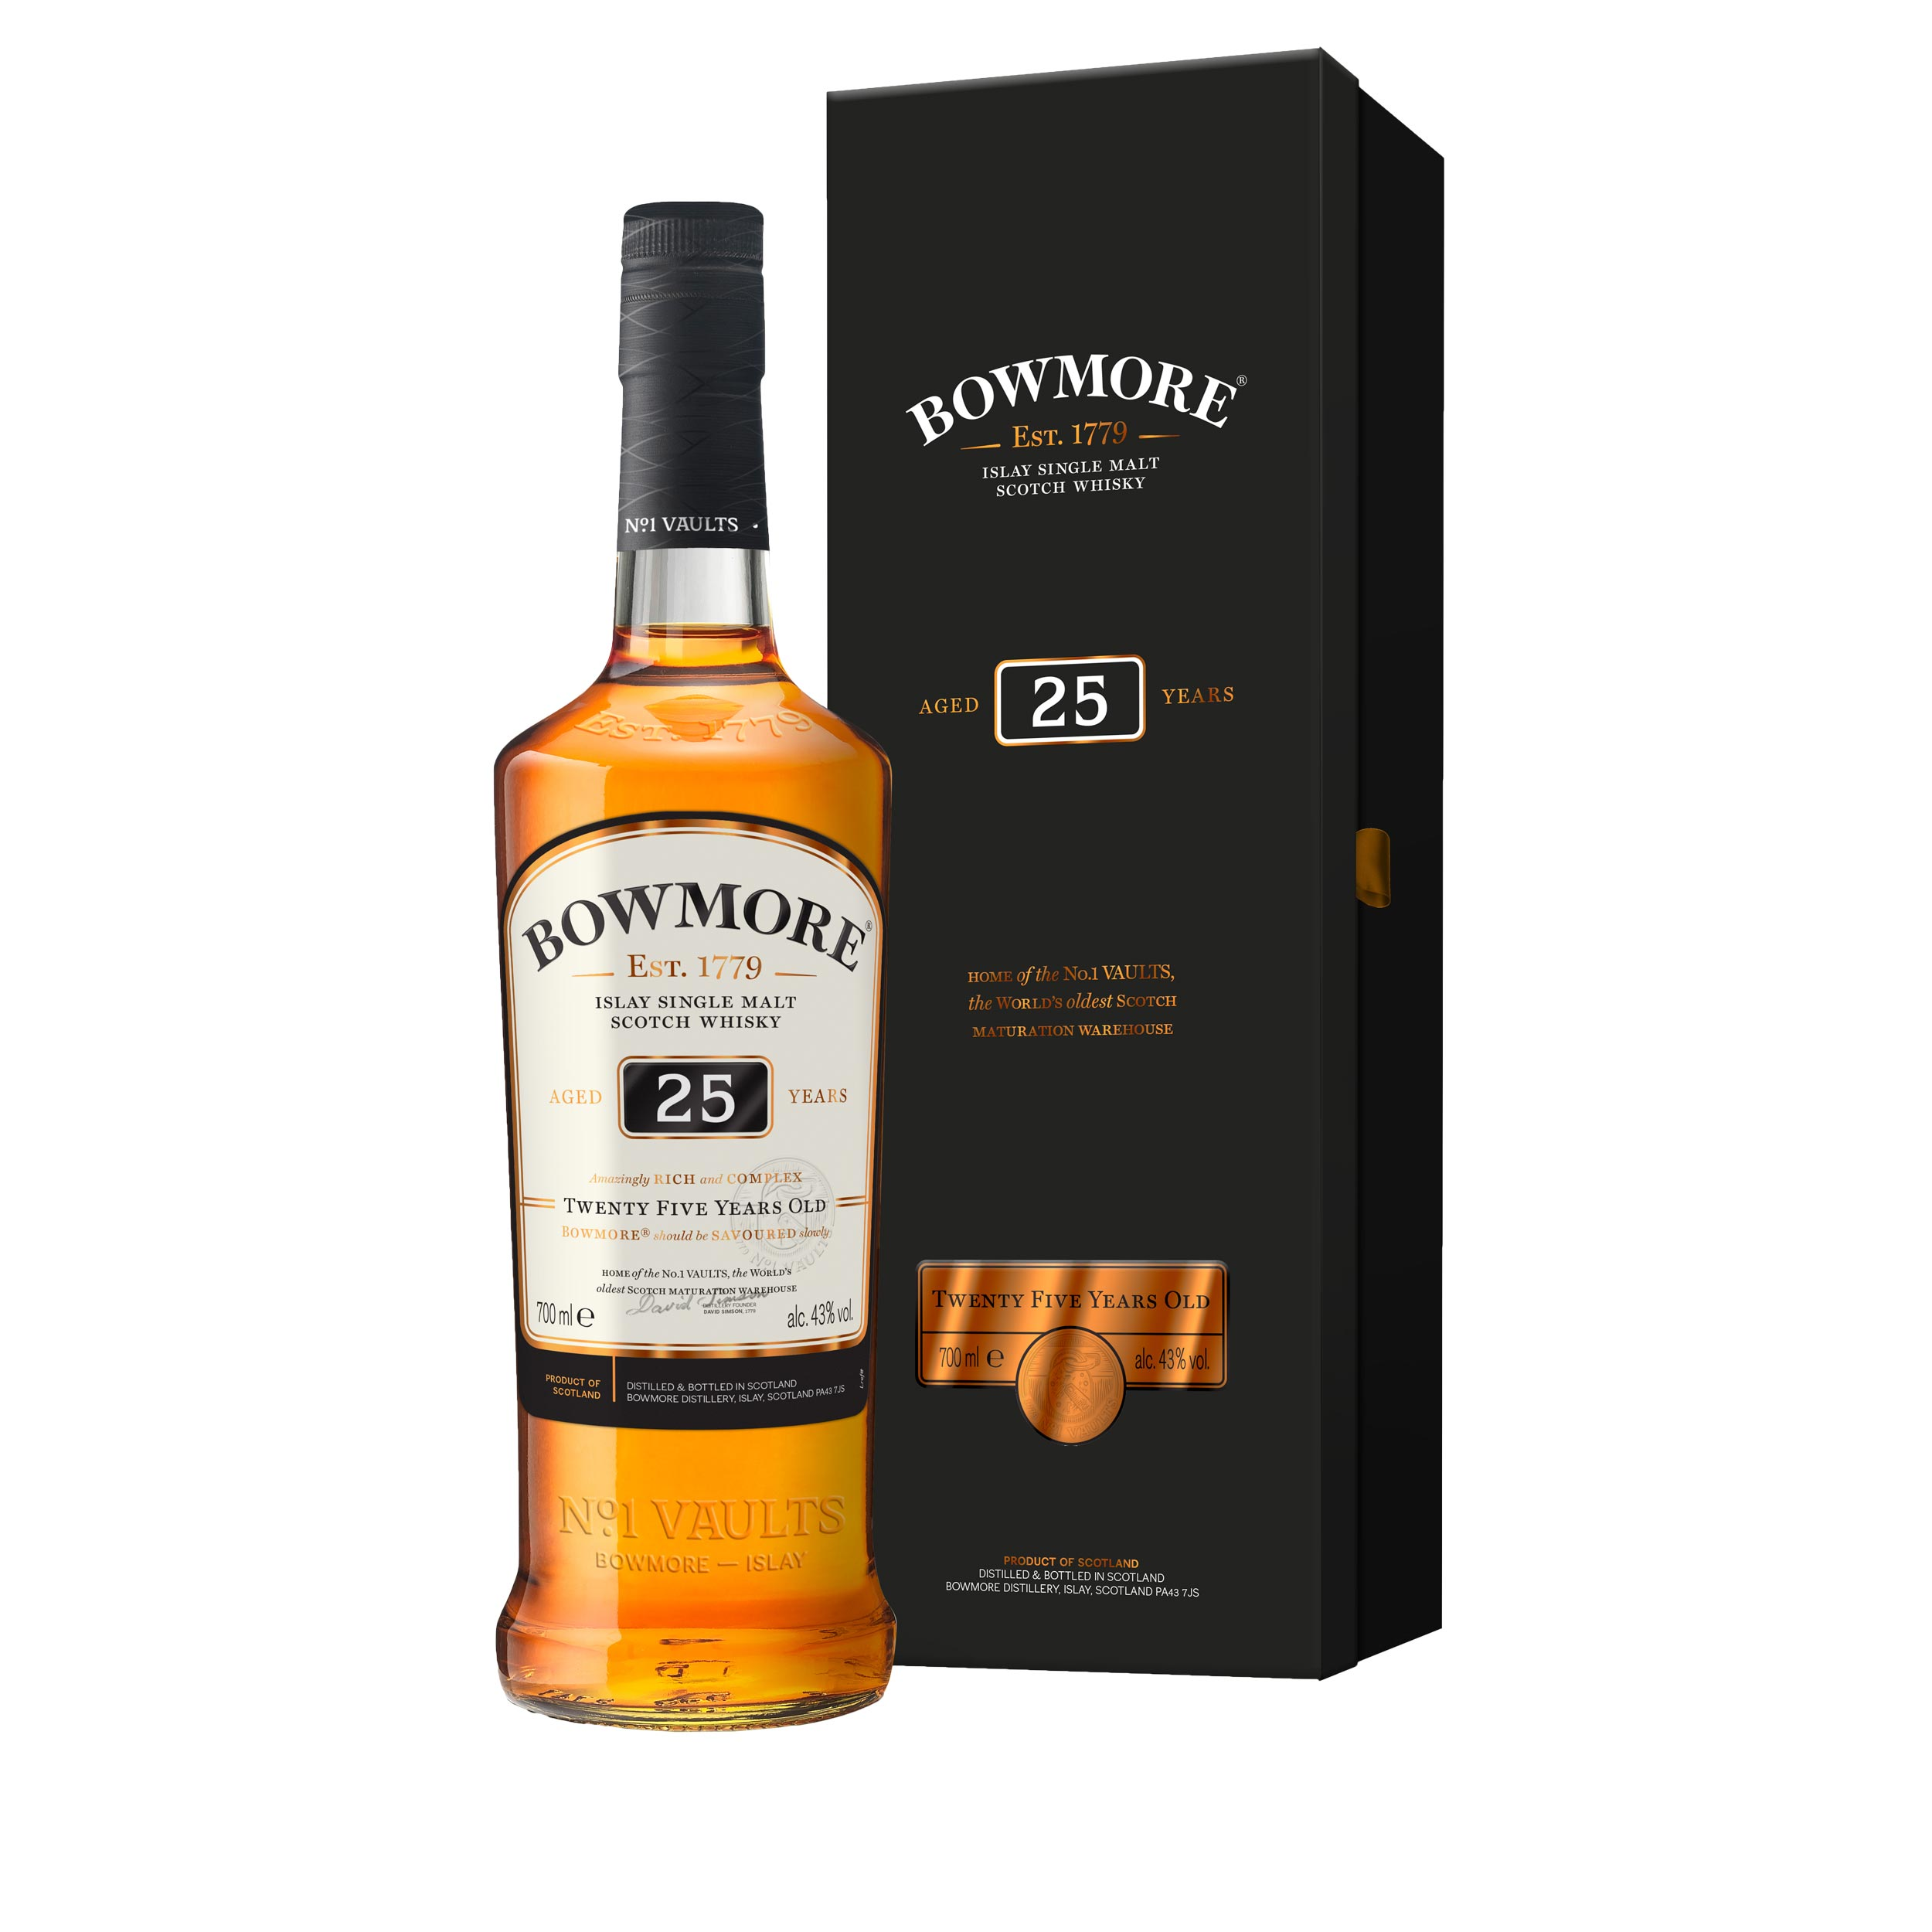 Bowmore 25 Year Old Islay Single Malt Scotch Whisky 70cl